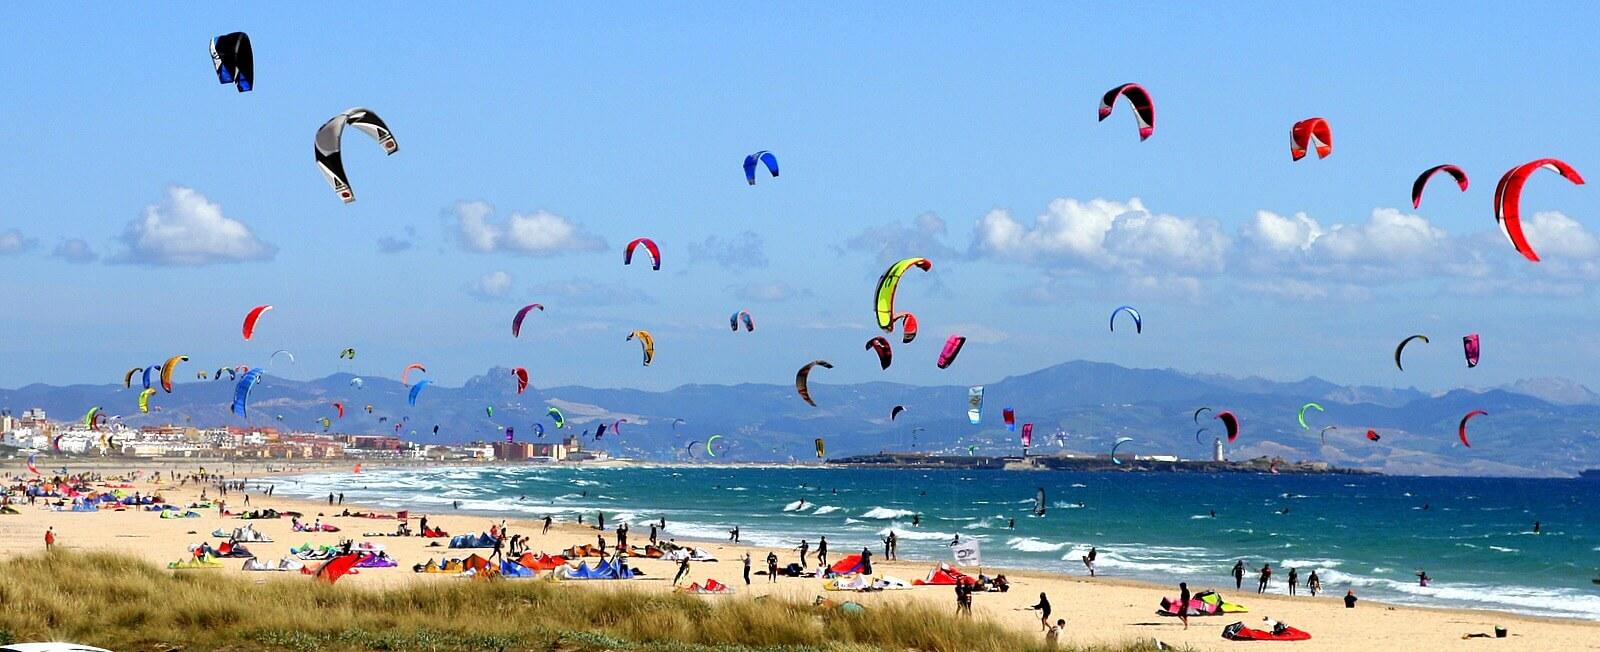 Playa de Valdevaqueros Kite Surf Cadiz Andalucia